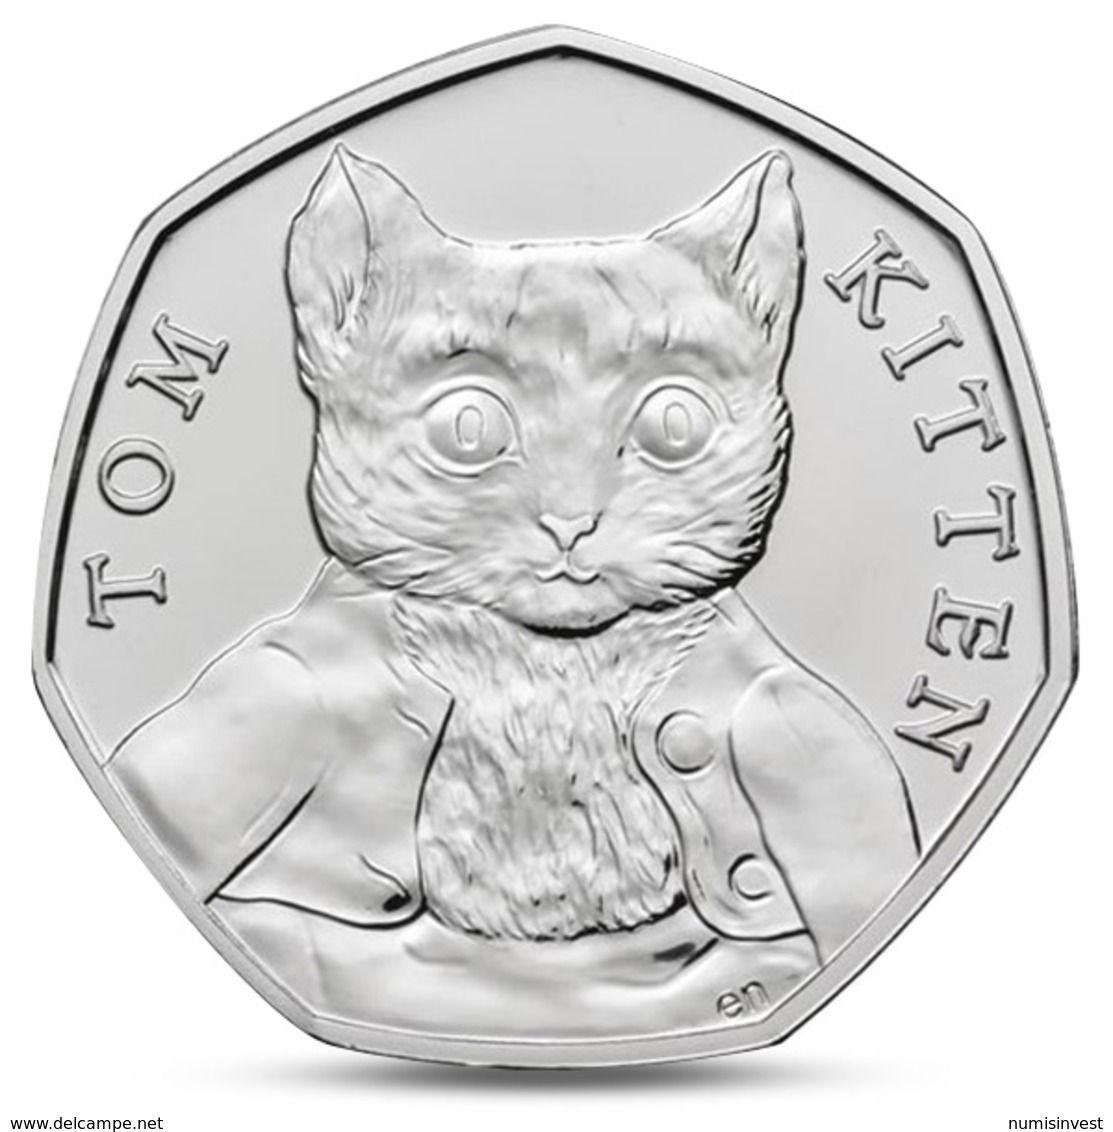 Great Britain Uk 50 Pence Beatrix Potter Tom Kitten 2017 Unc 1971 Decimal Coins Coins 50p Coin Beatrix Potter